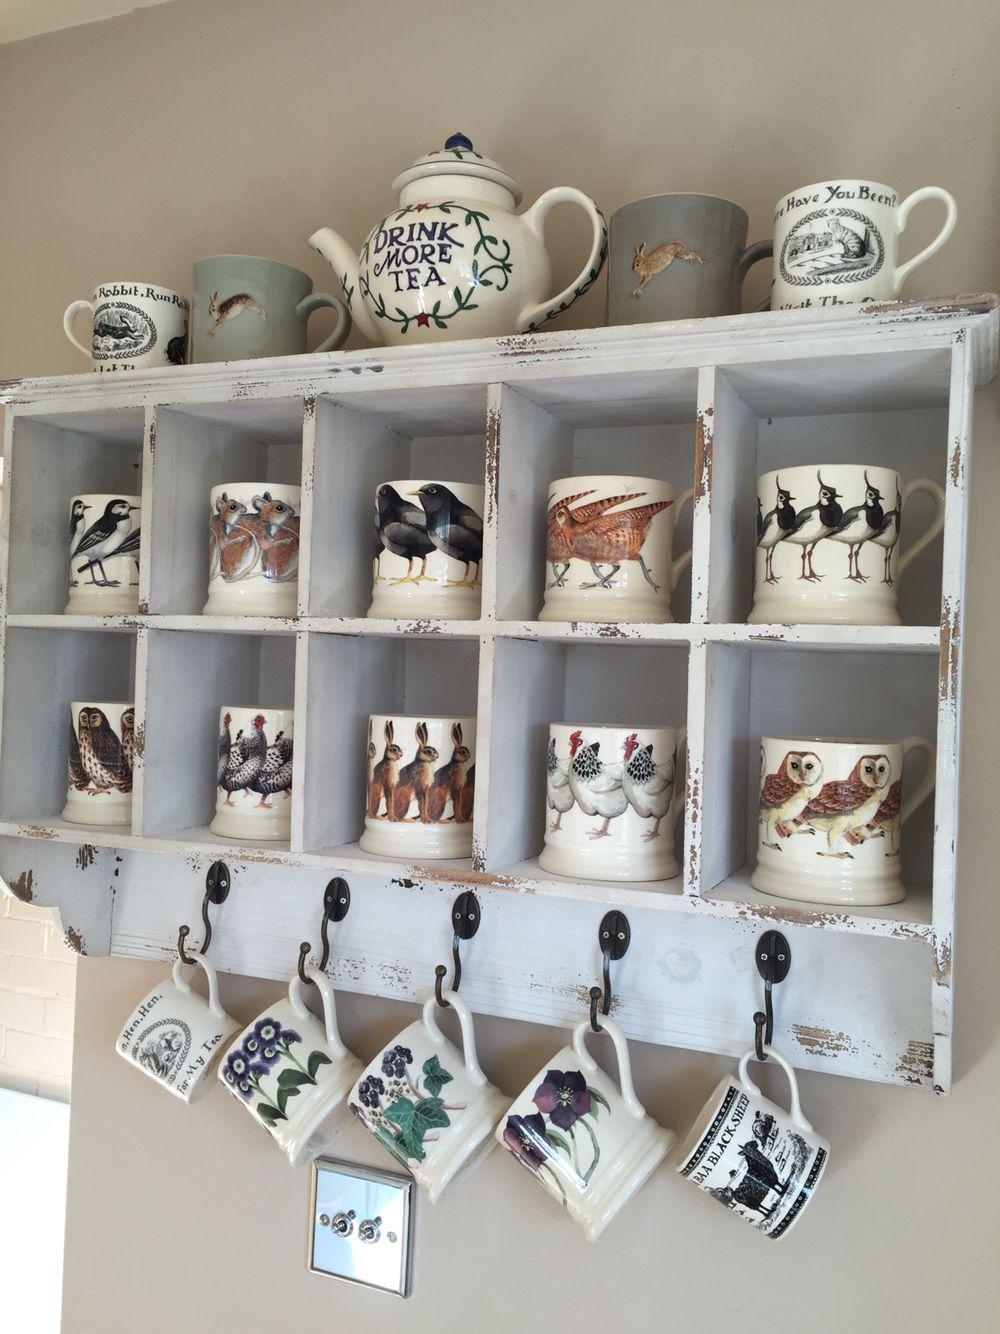 Assorted Emma Bridgewater mugs and Drink More Tea teapot. Pigeon hole shelving. & Assorted Emma Bridgewater mugs and Drink More Tea teapot. Pigeon ...